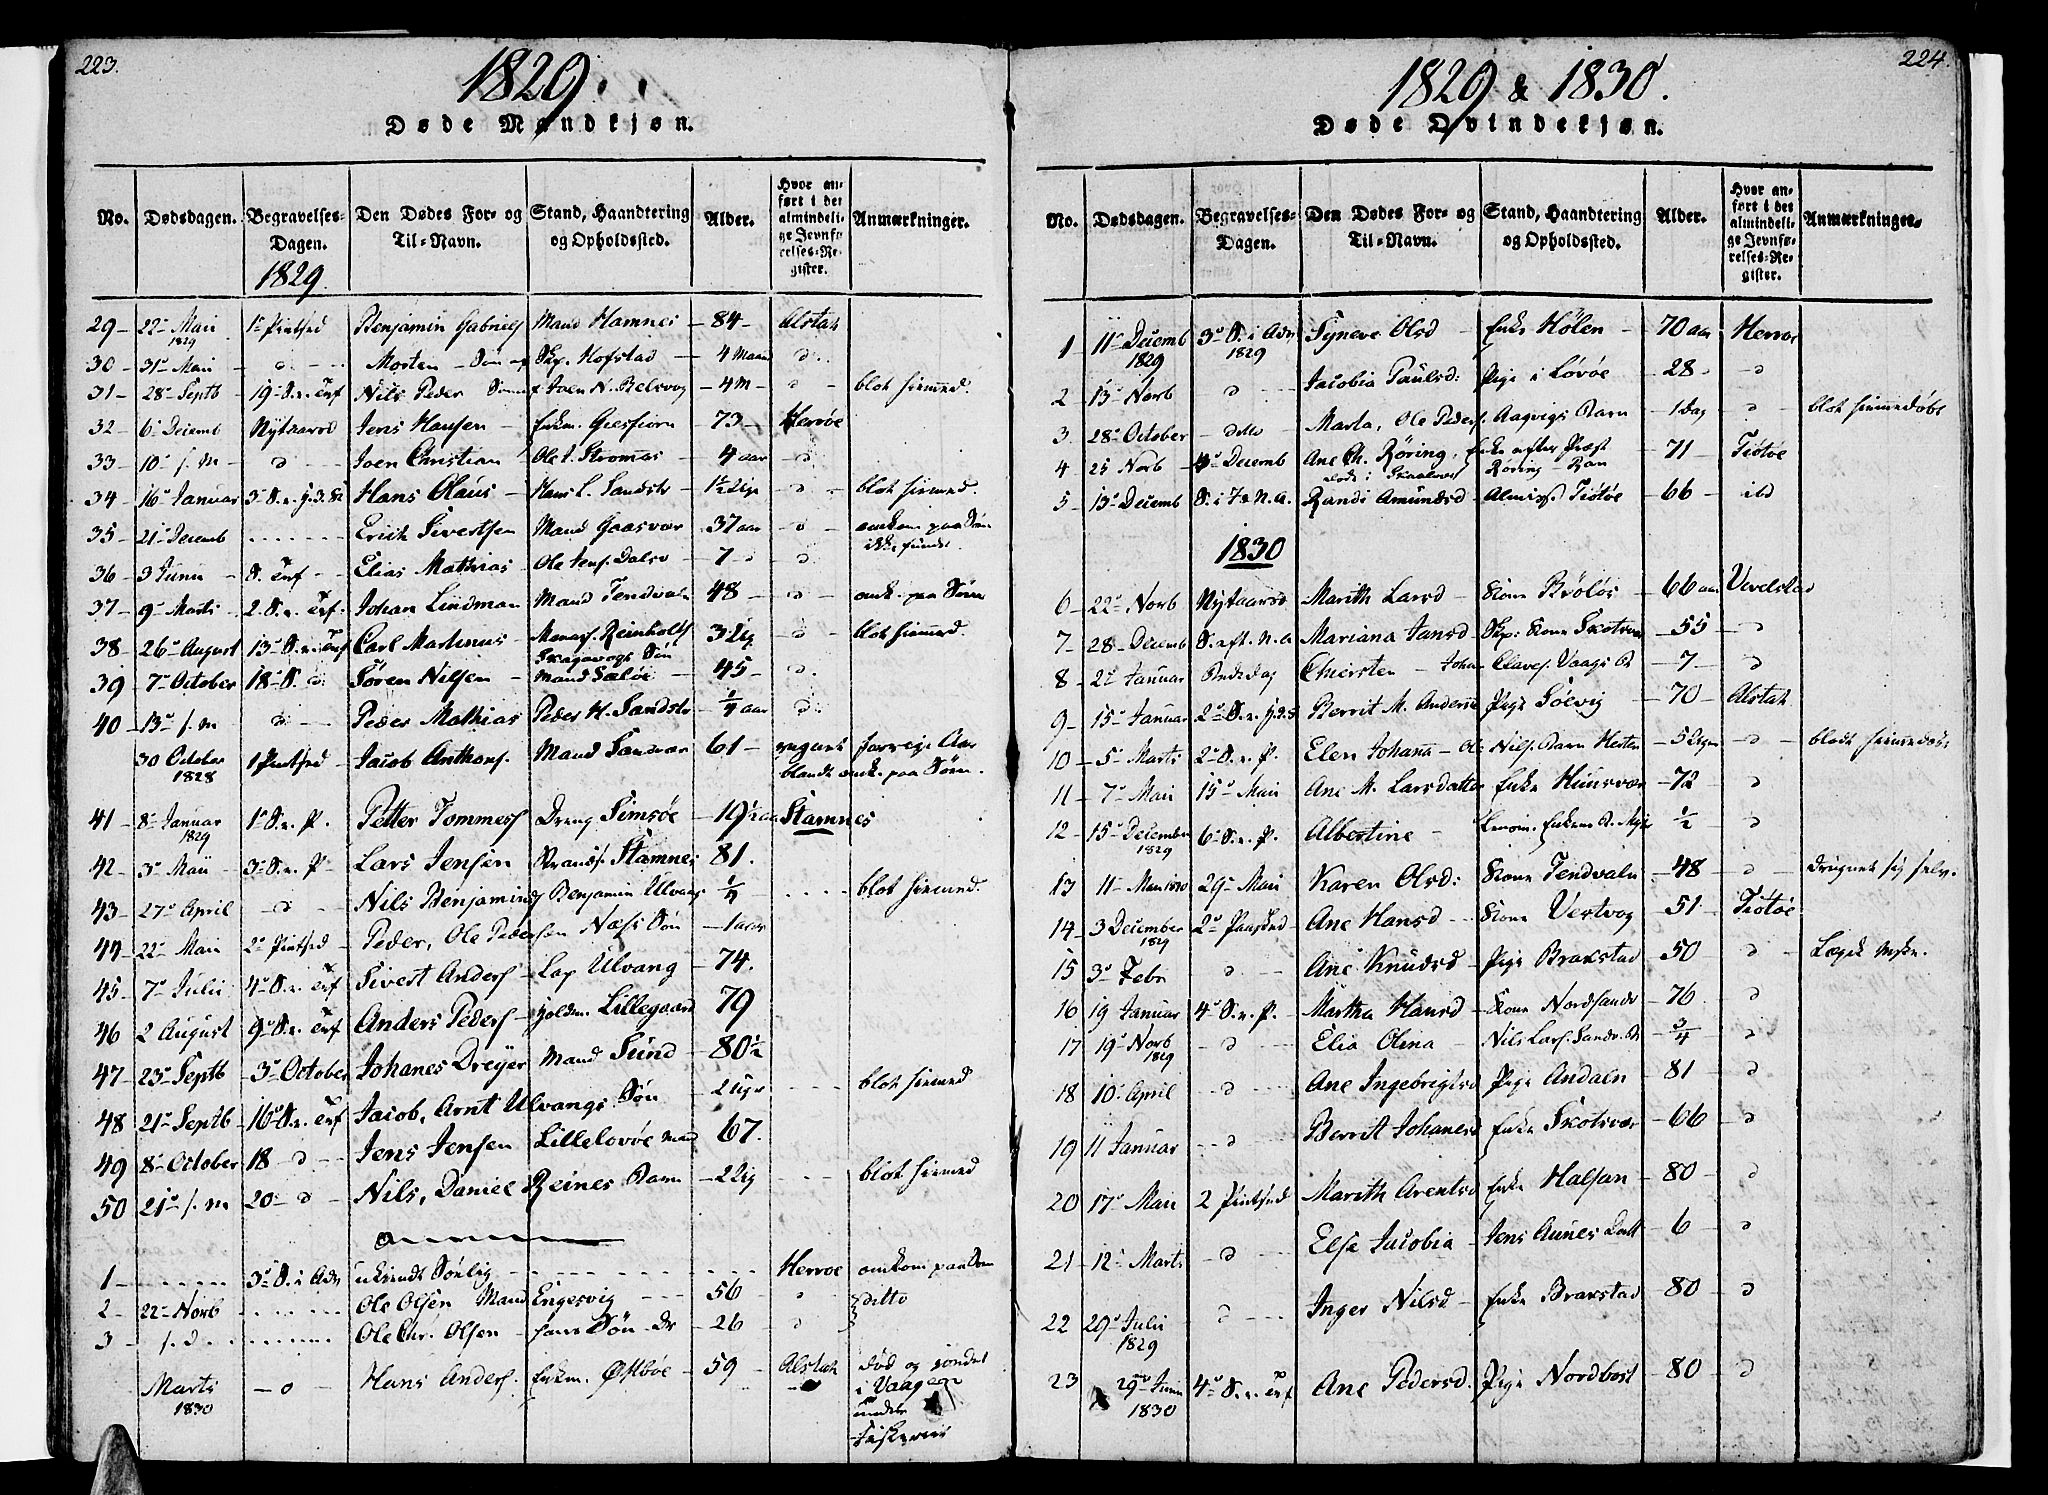 SAT, Ministerialprotokoller, klokkerbøker og fødselsregistre - Nordland, 830/L0445: Ministerialbok nr. 830A09, 1820-1830, s. 223-224